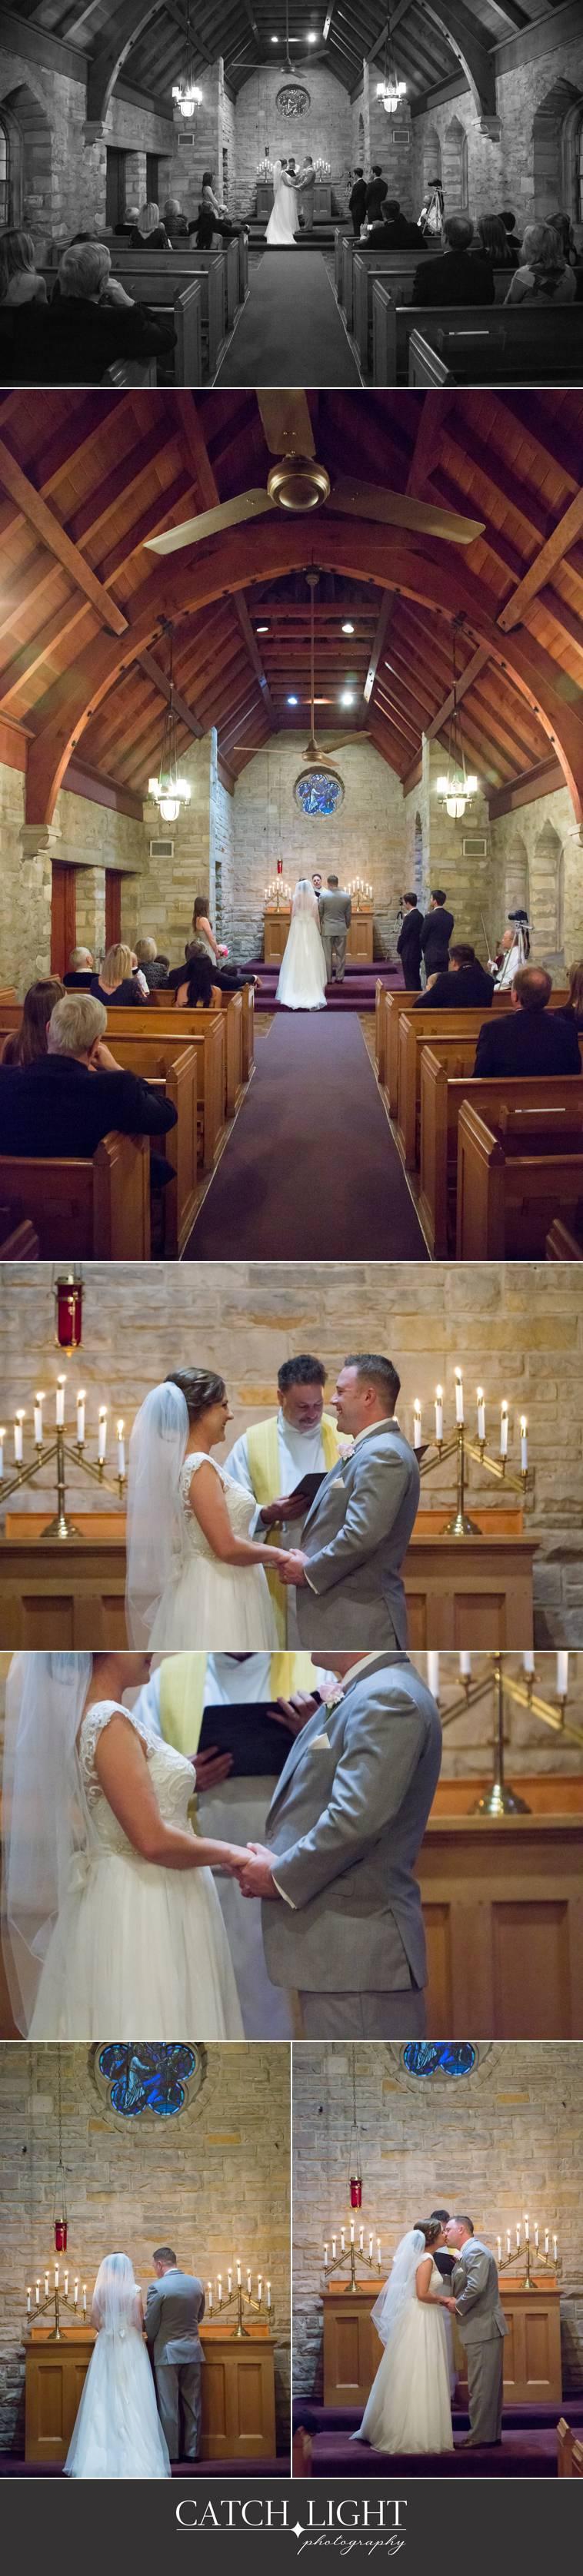 06_Wedding Photographer at Pilgrim Chapel